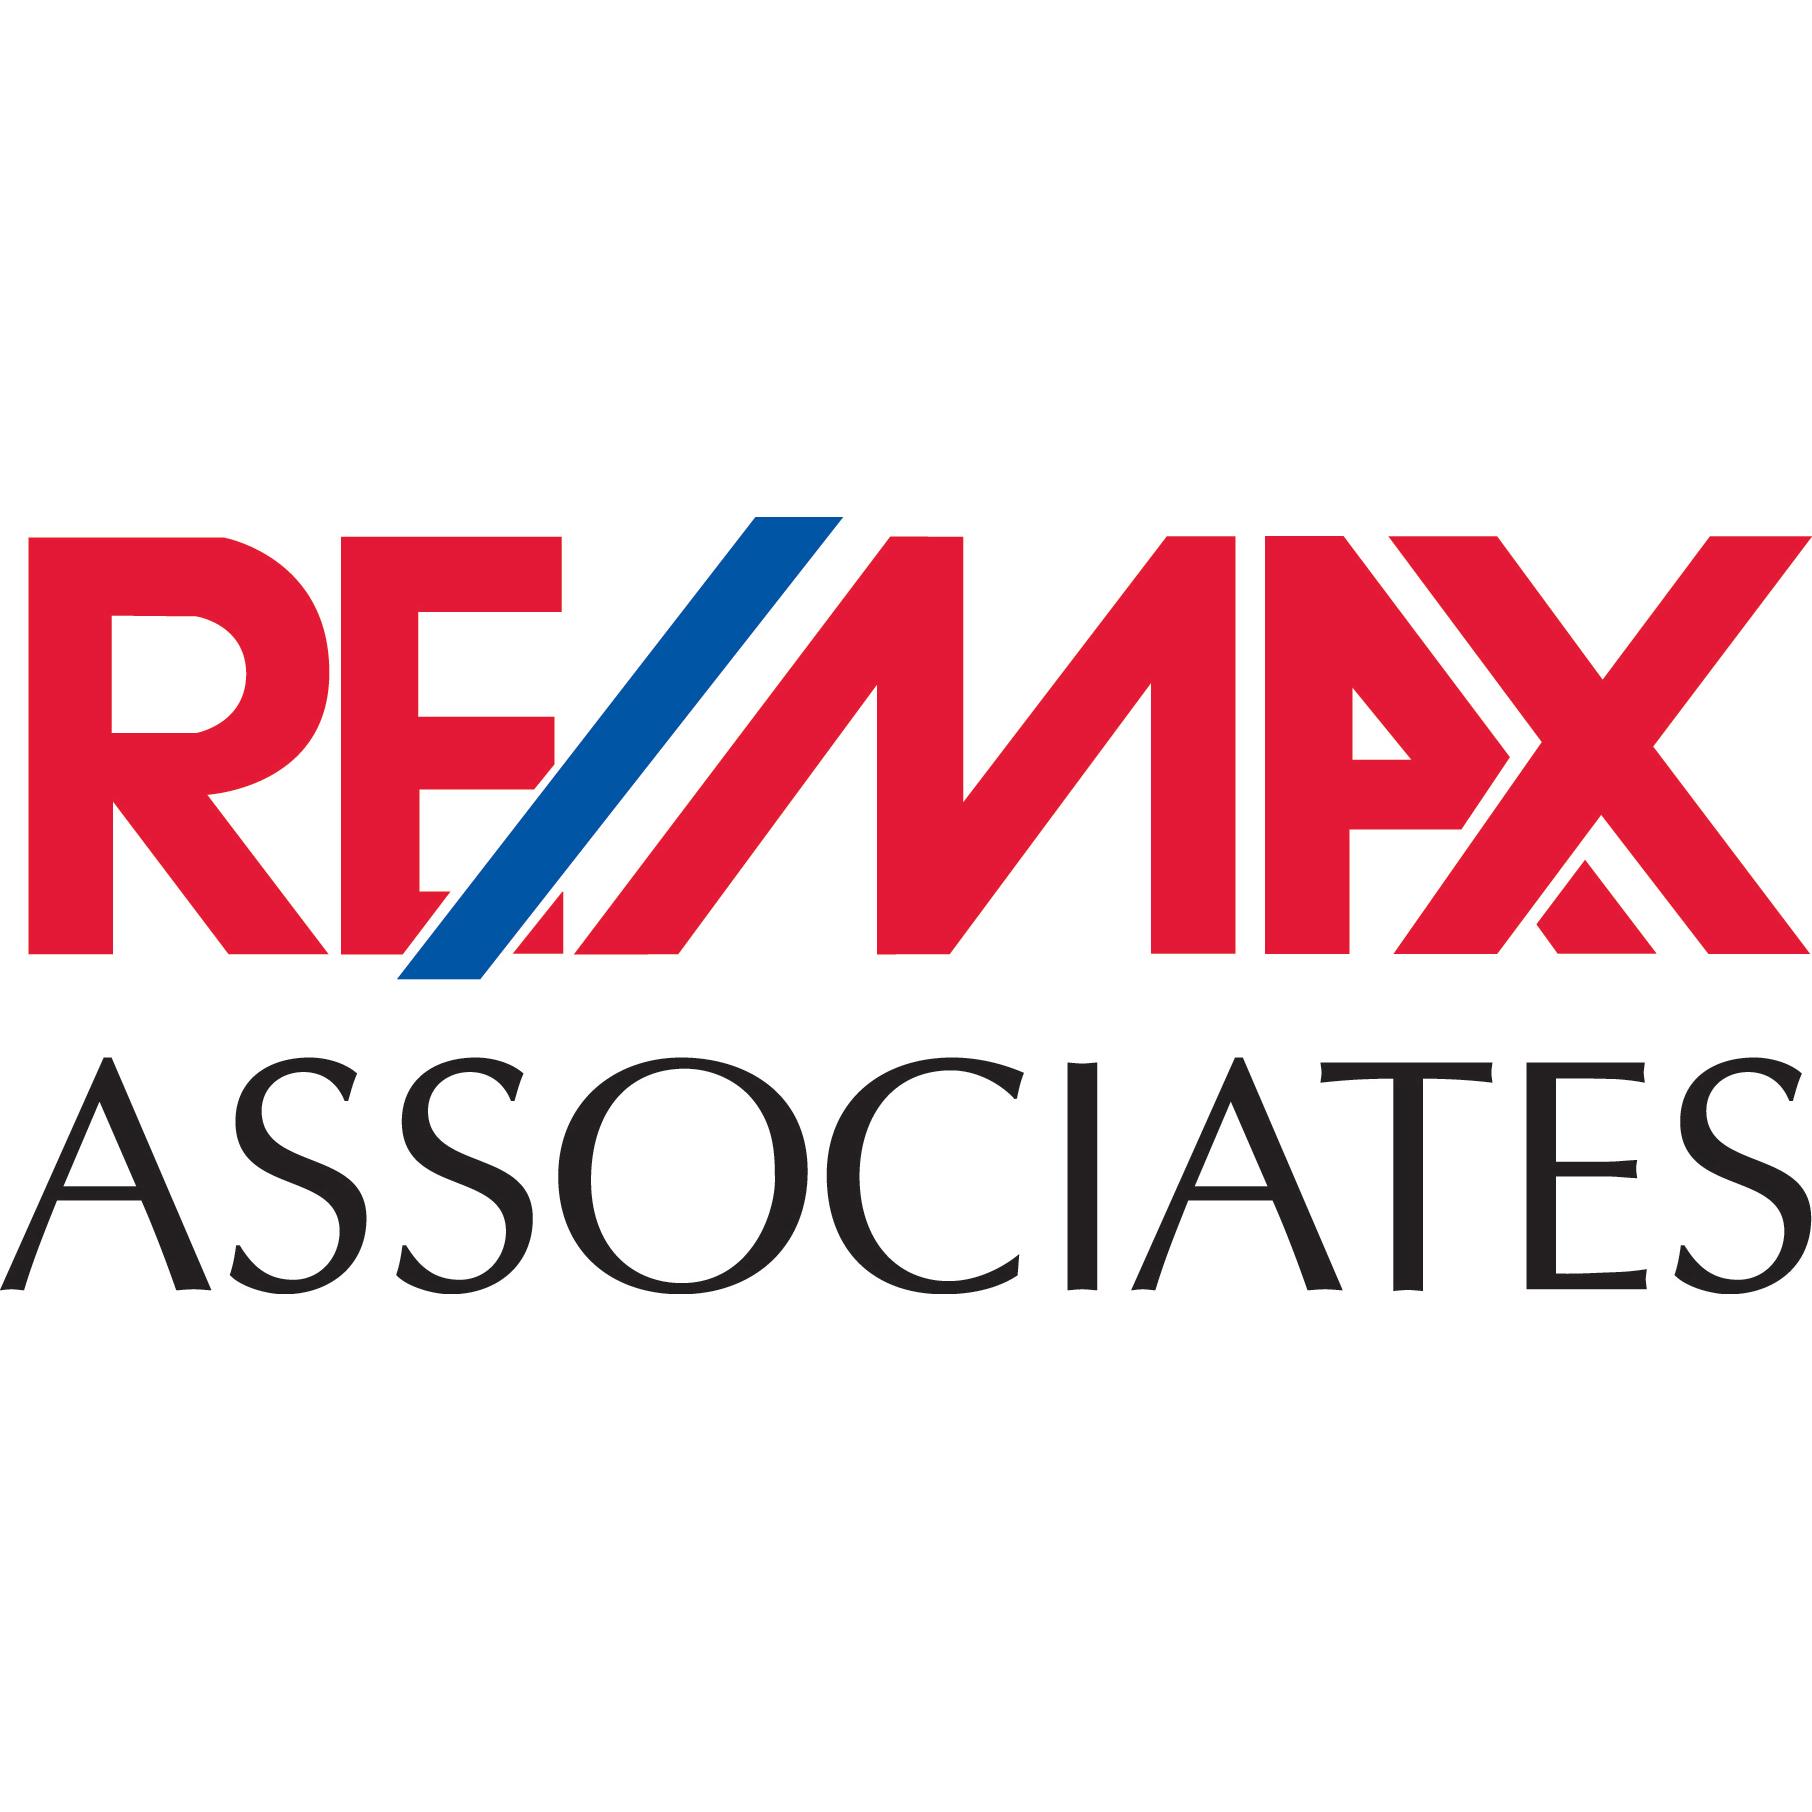 RE/MAX Associates - Brett Sellick image 1